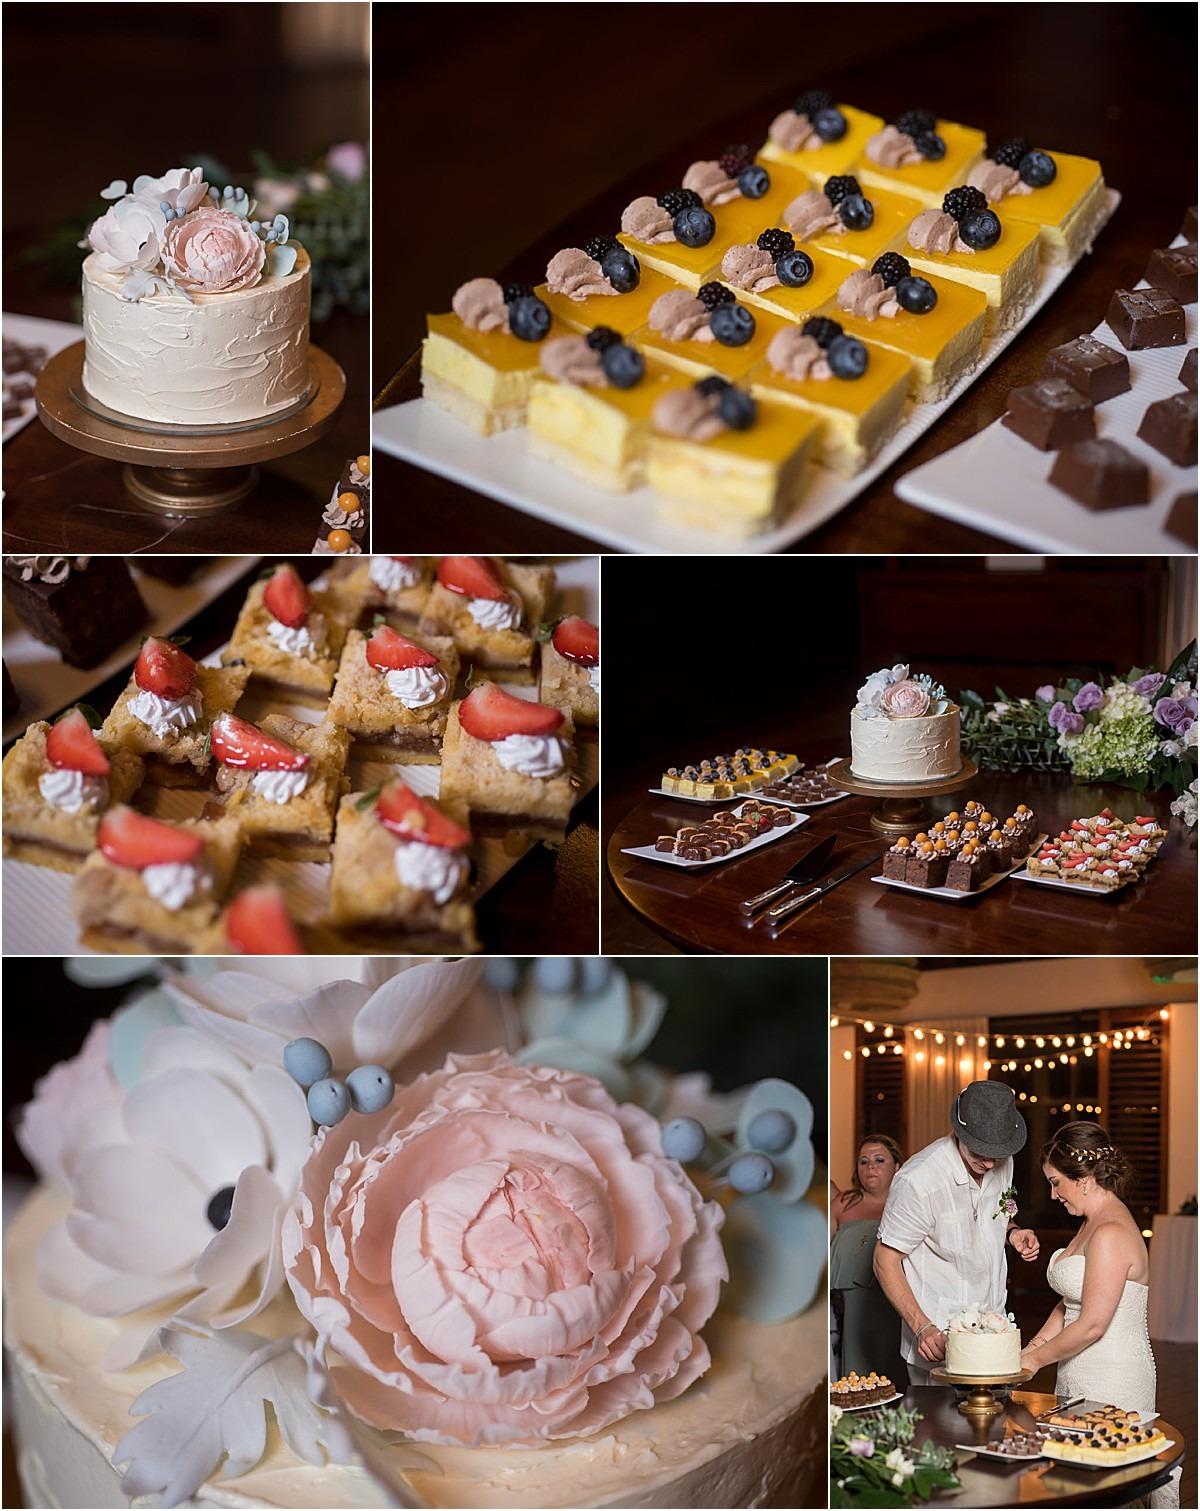 dessert costa rica catering cr